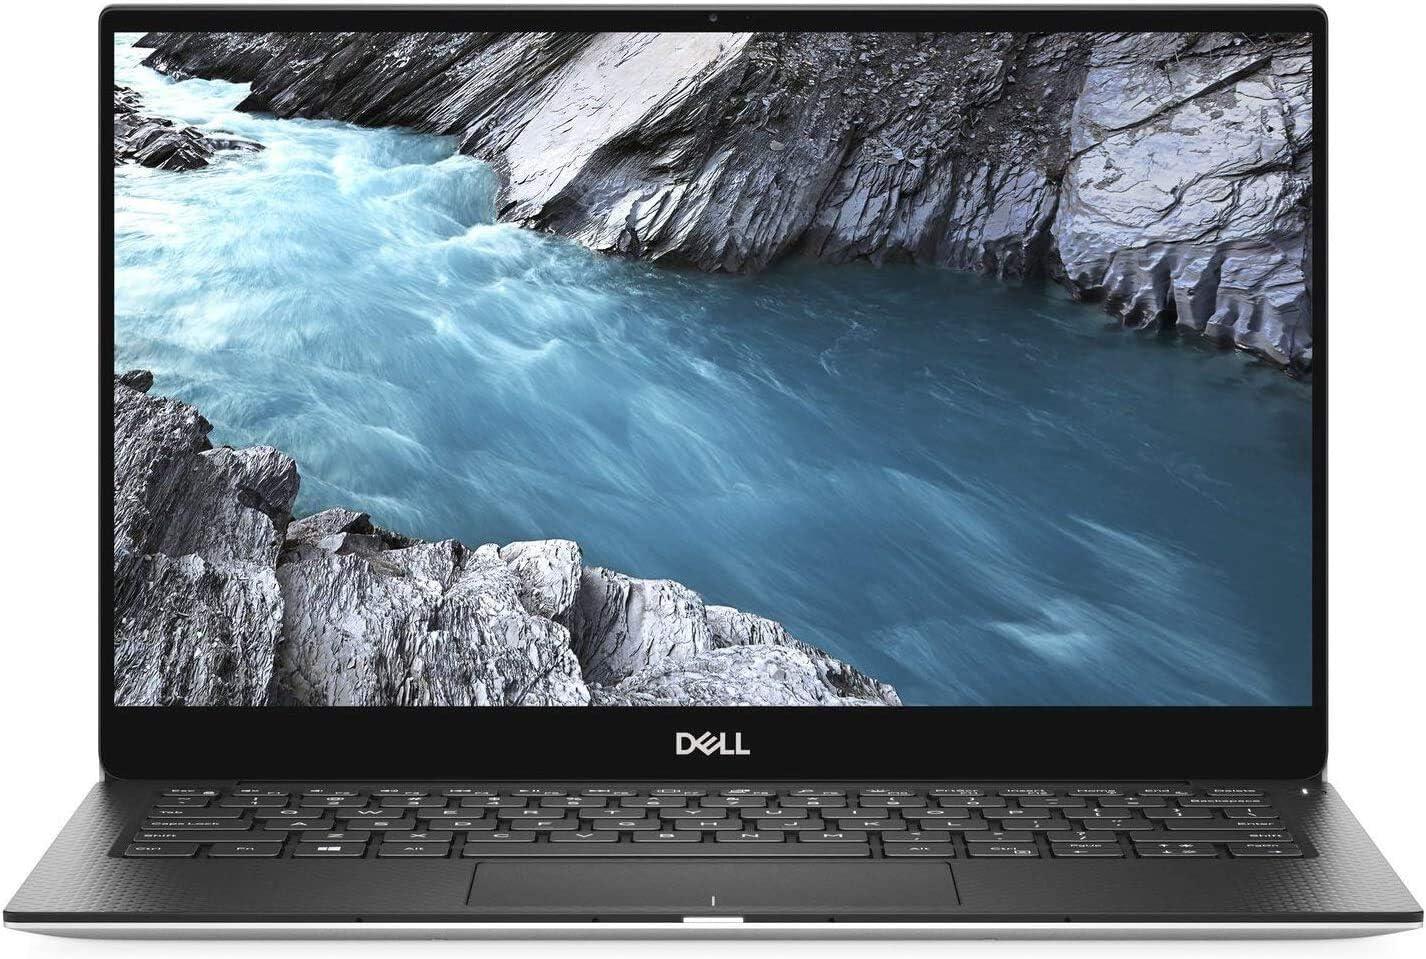 "Latest_Dell XPS 13.3"" FHD InfinityEdge Touch Display Laptop, 10th Gen Intel i7-10710U Processor , 16GB RAM, 512GB SSD, Wireless+Bluetooth, Backlit Keyboard, Fingerprint Reader, HDMI,Window 10"